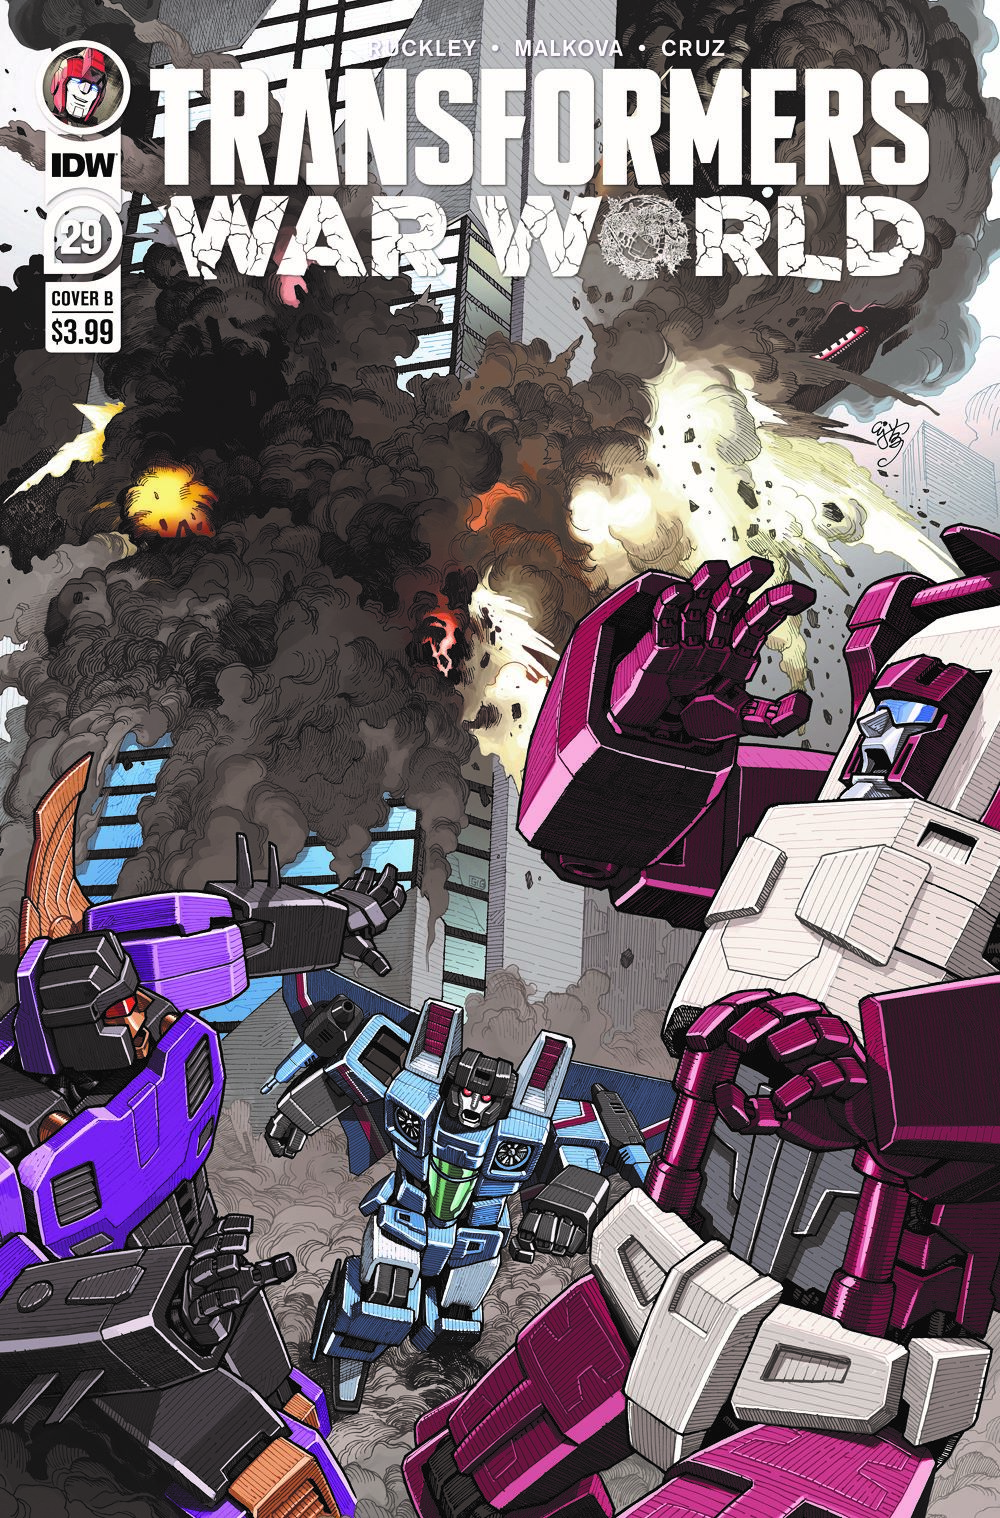 TF29-cvr-B-rev ComicList Previews: TRANSFORMERS #29